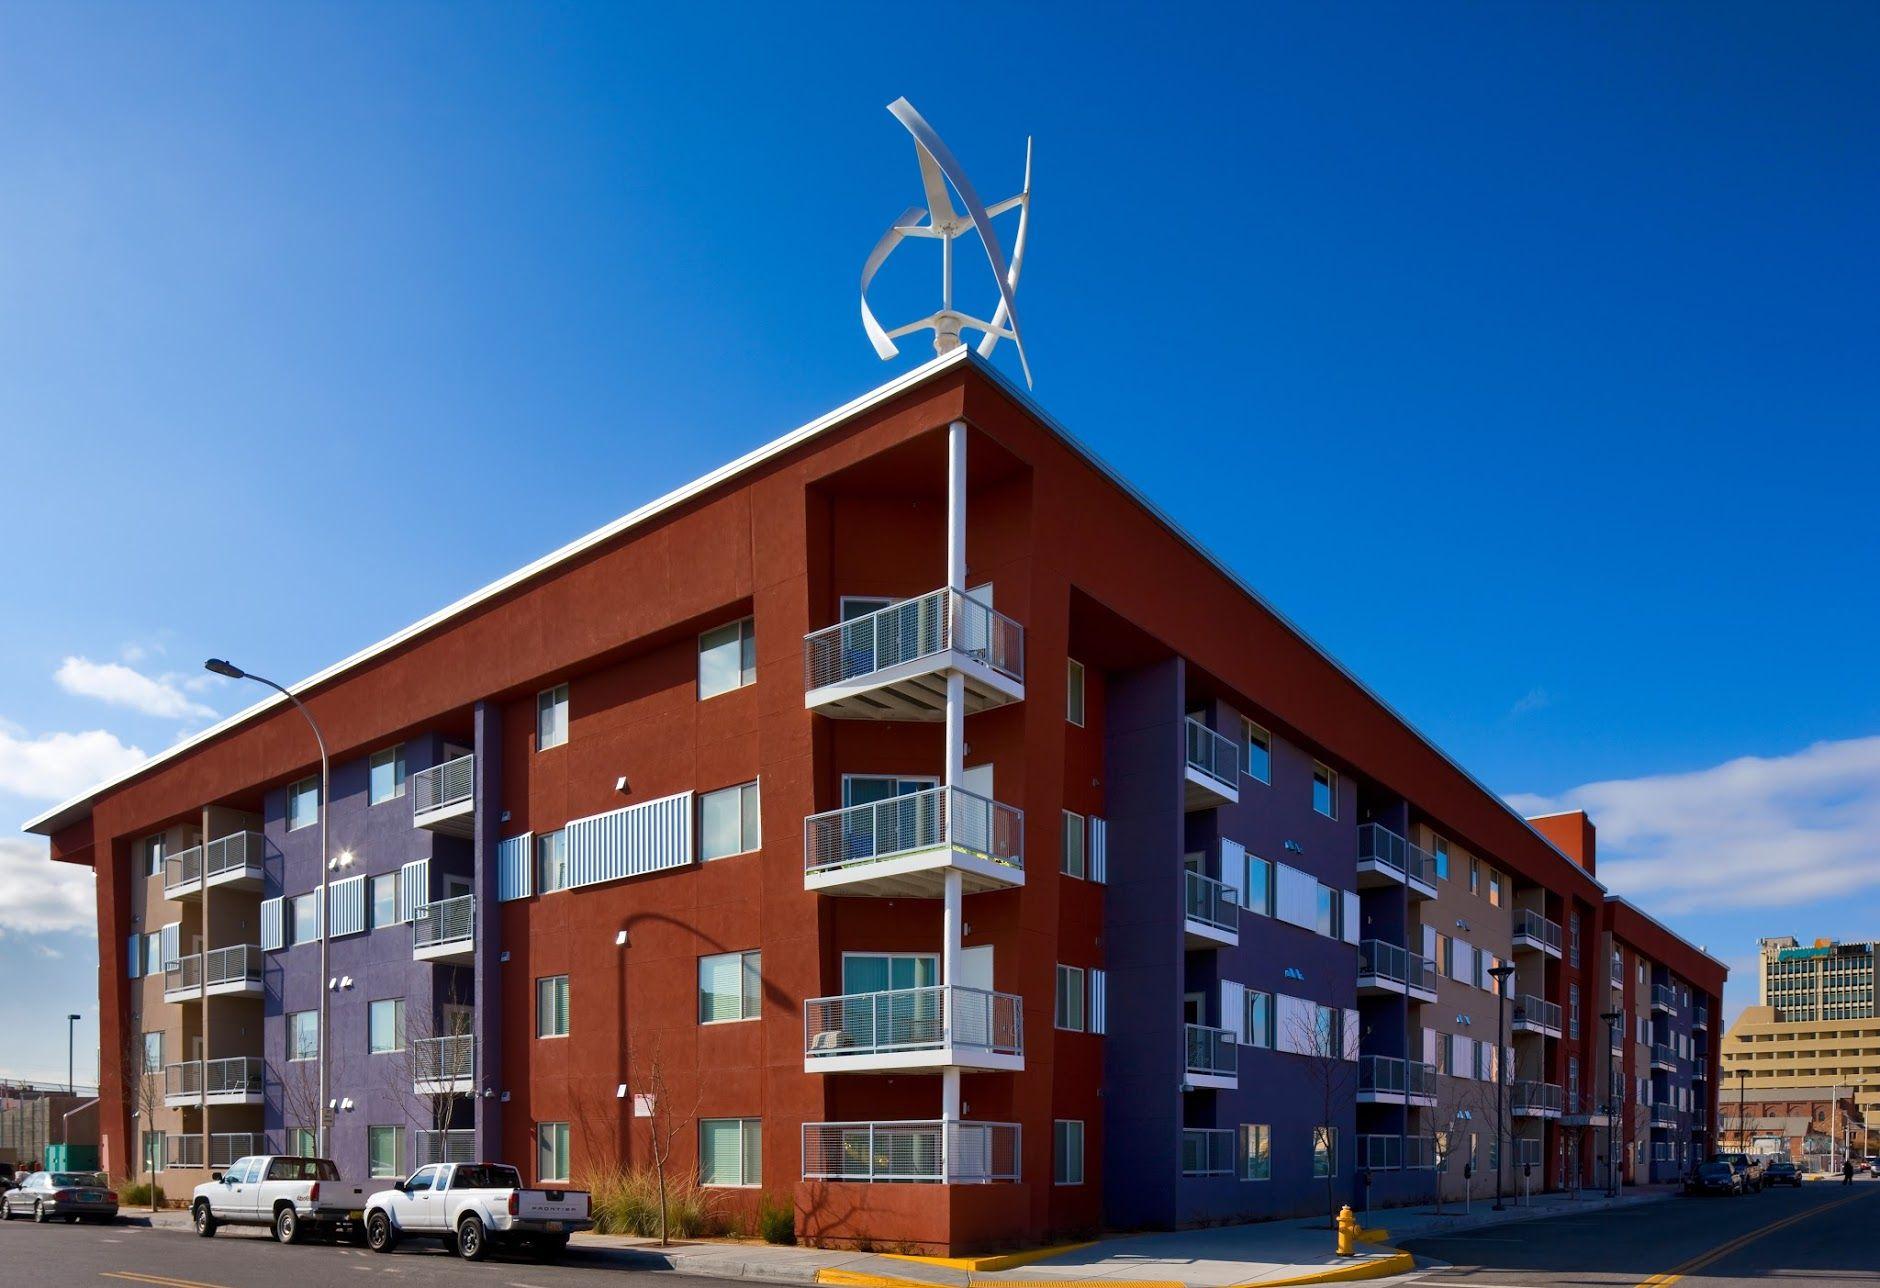 Silver Gardens Apartments Albuquerque Nm Apartment Garden Housing Options Low Cost Housing